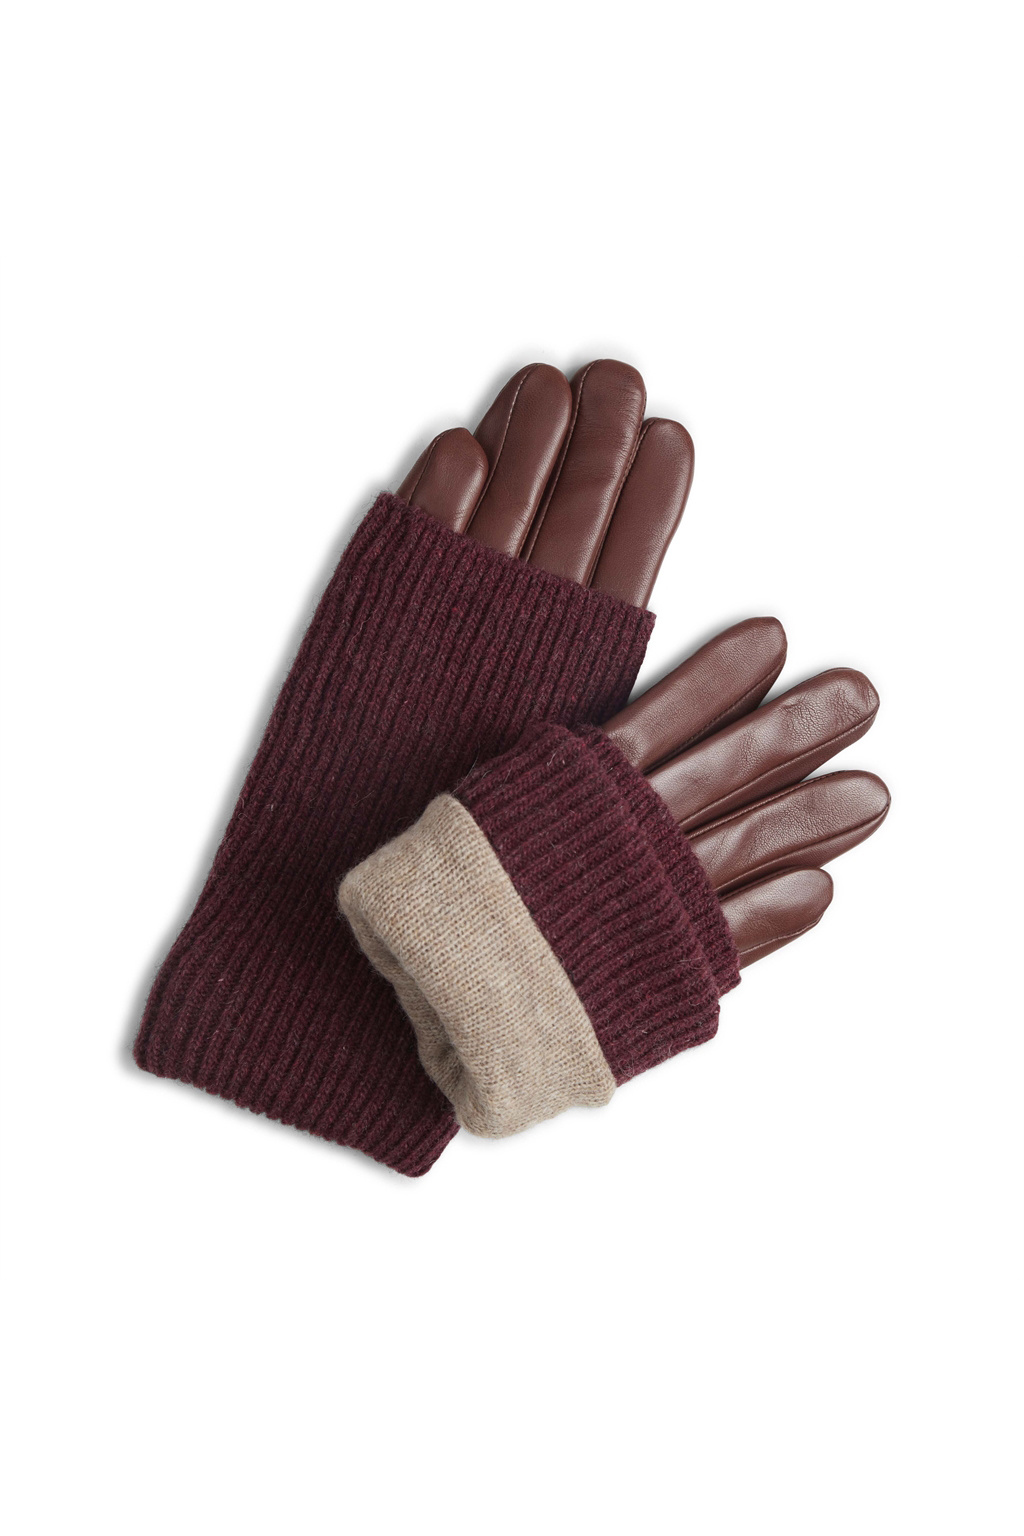 Helly Glove - Cognac w/ Burgundy-3